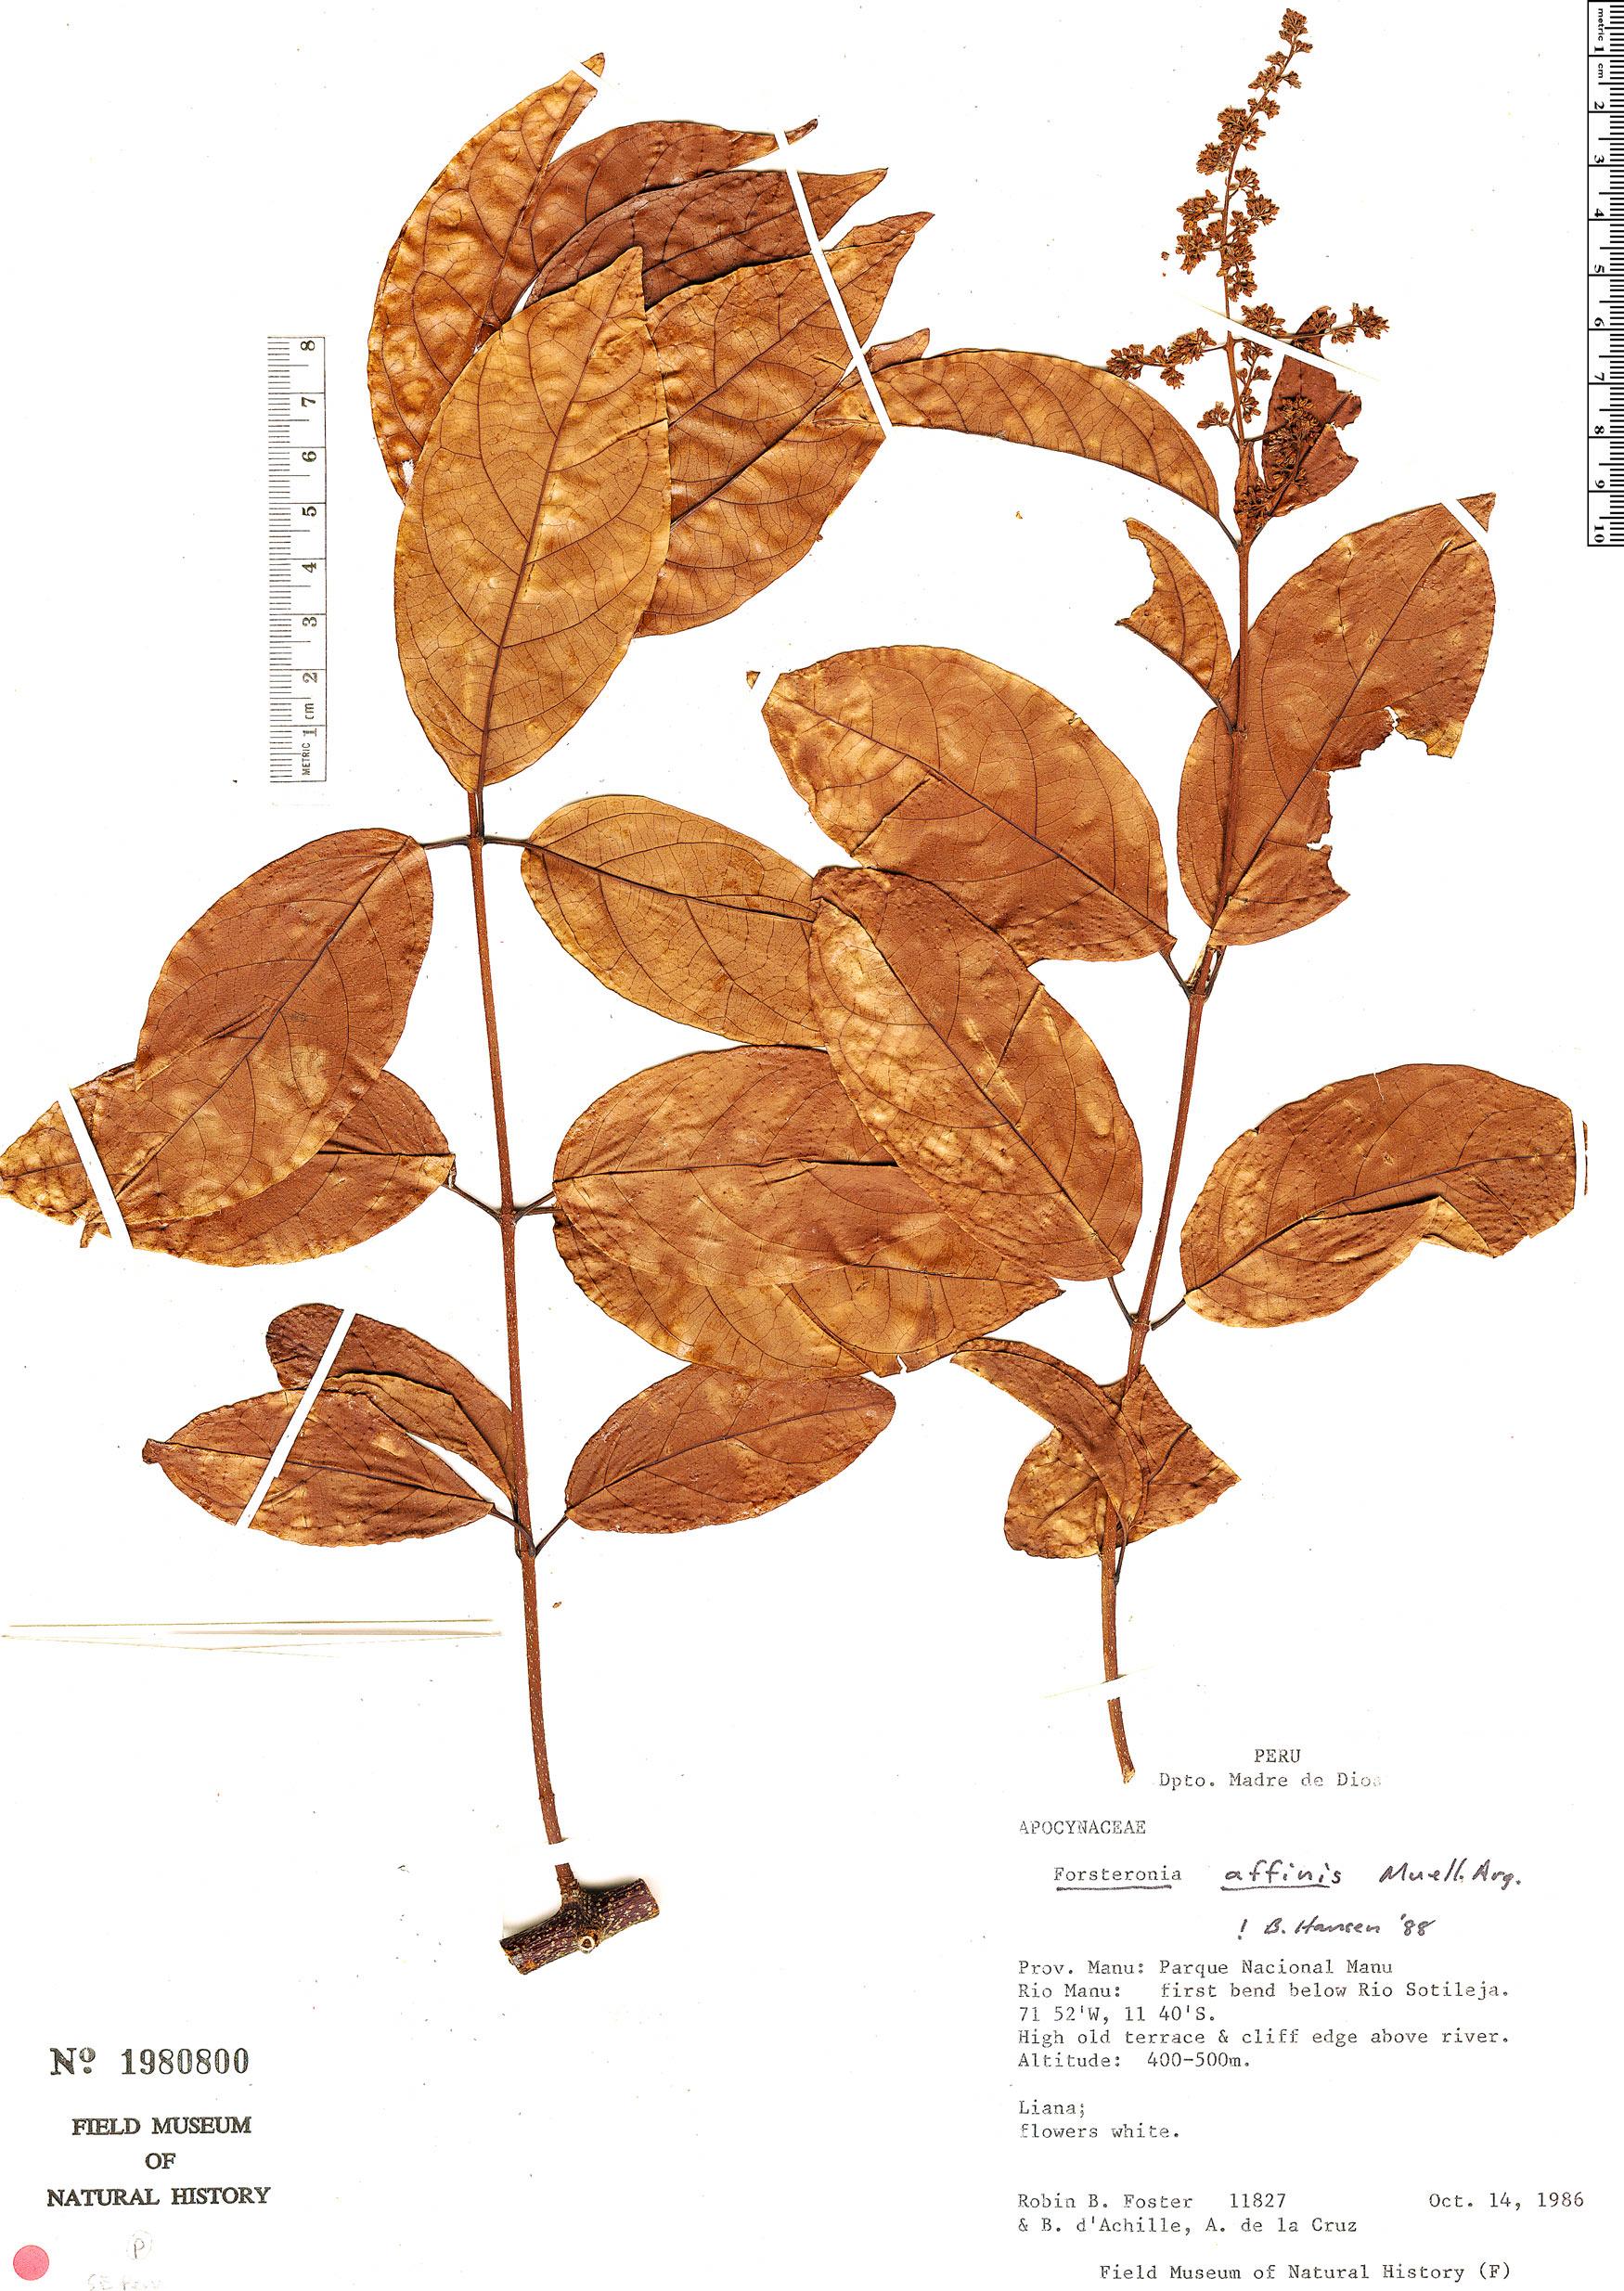 Espécime: Forsteronia affinis